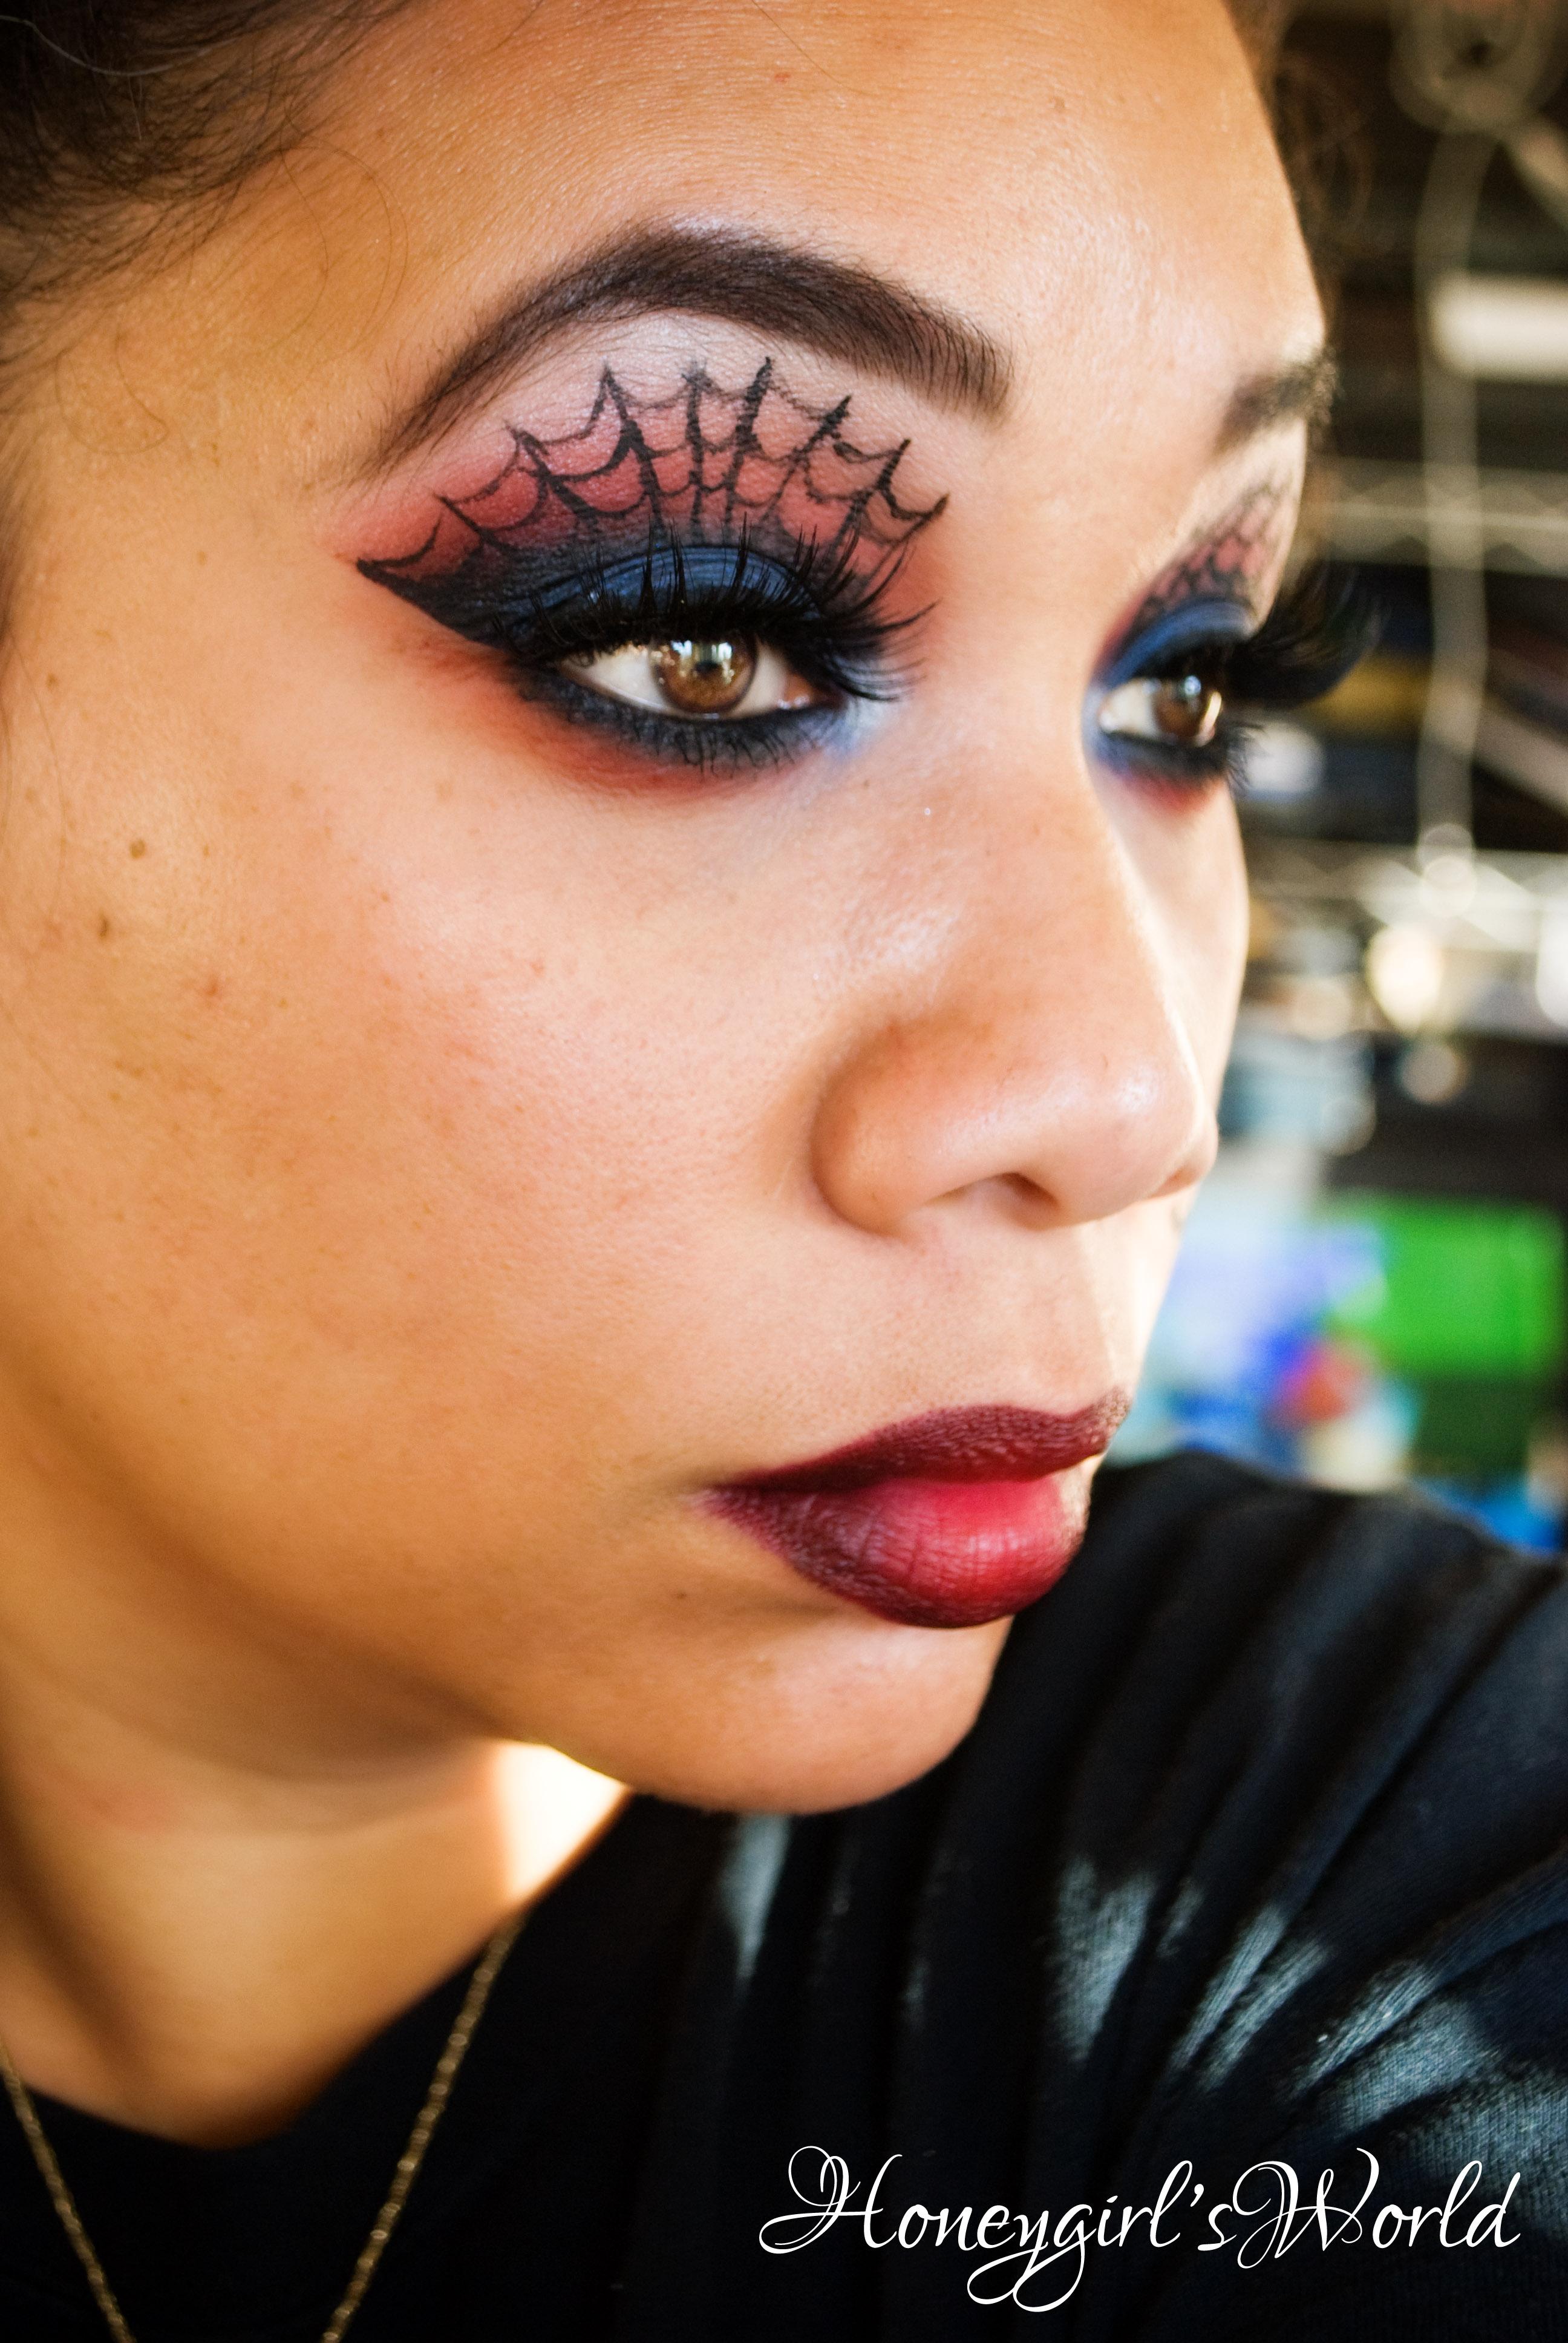 The Amazing Spiderman Makeup